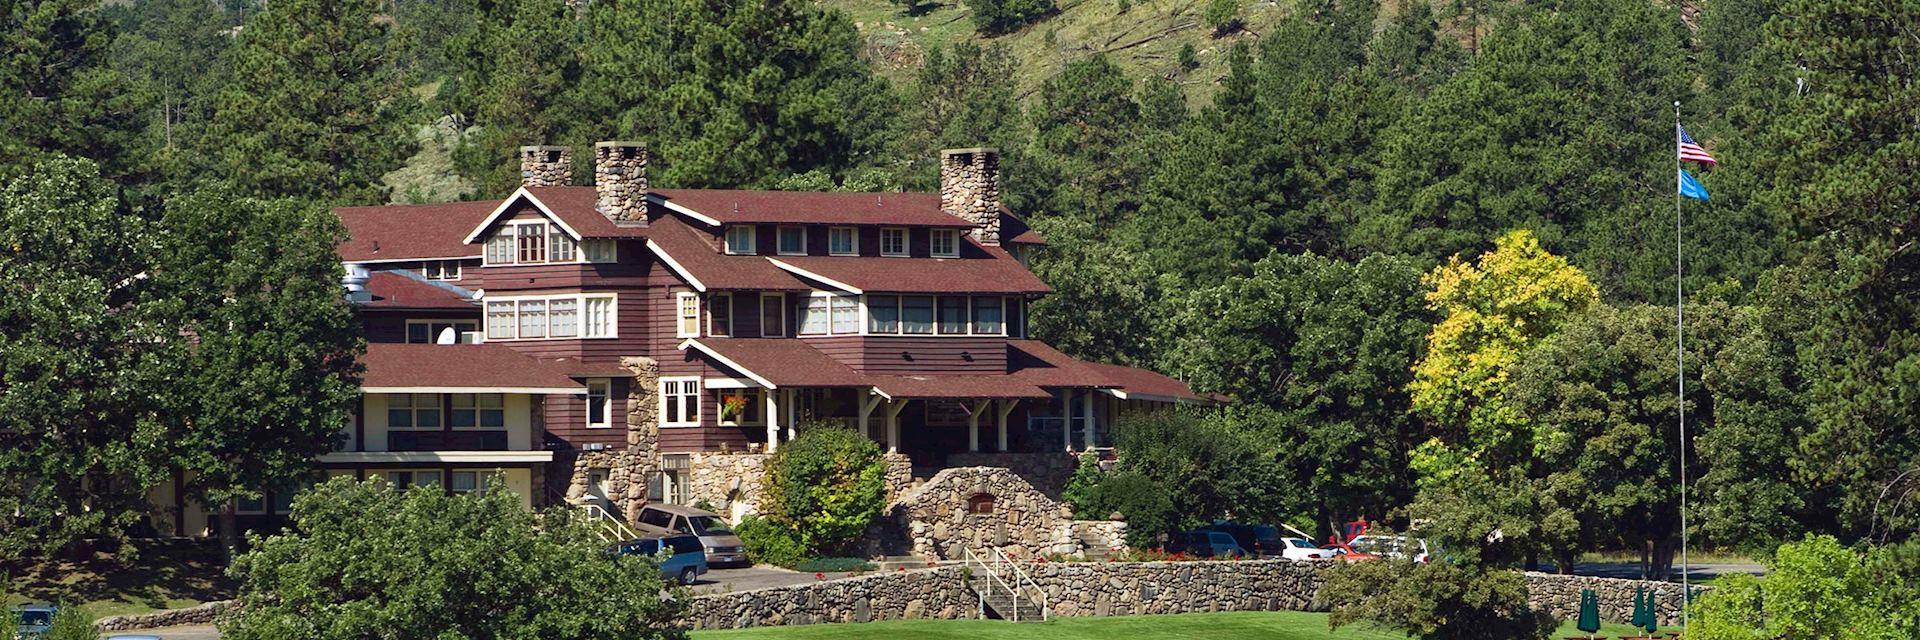 State Game Lodge, Custer